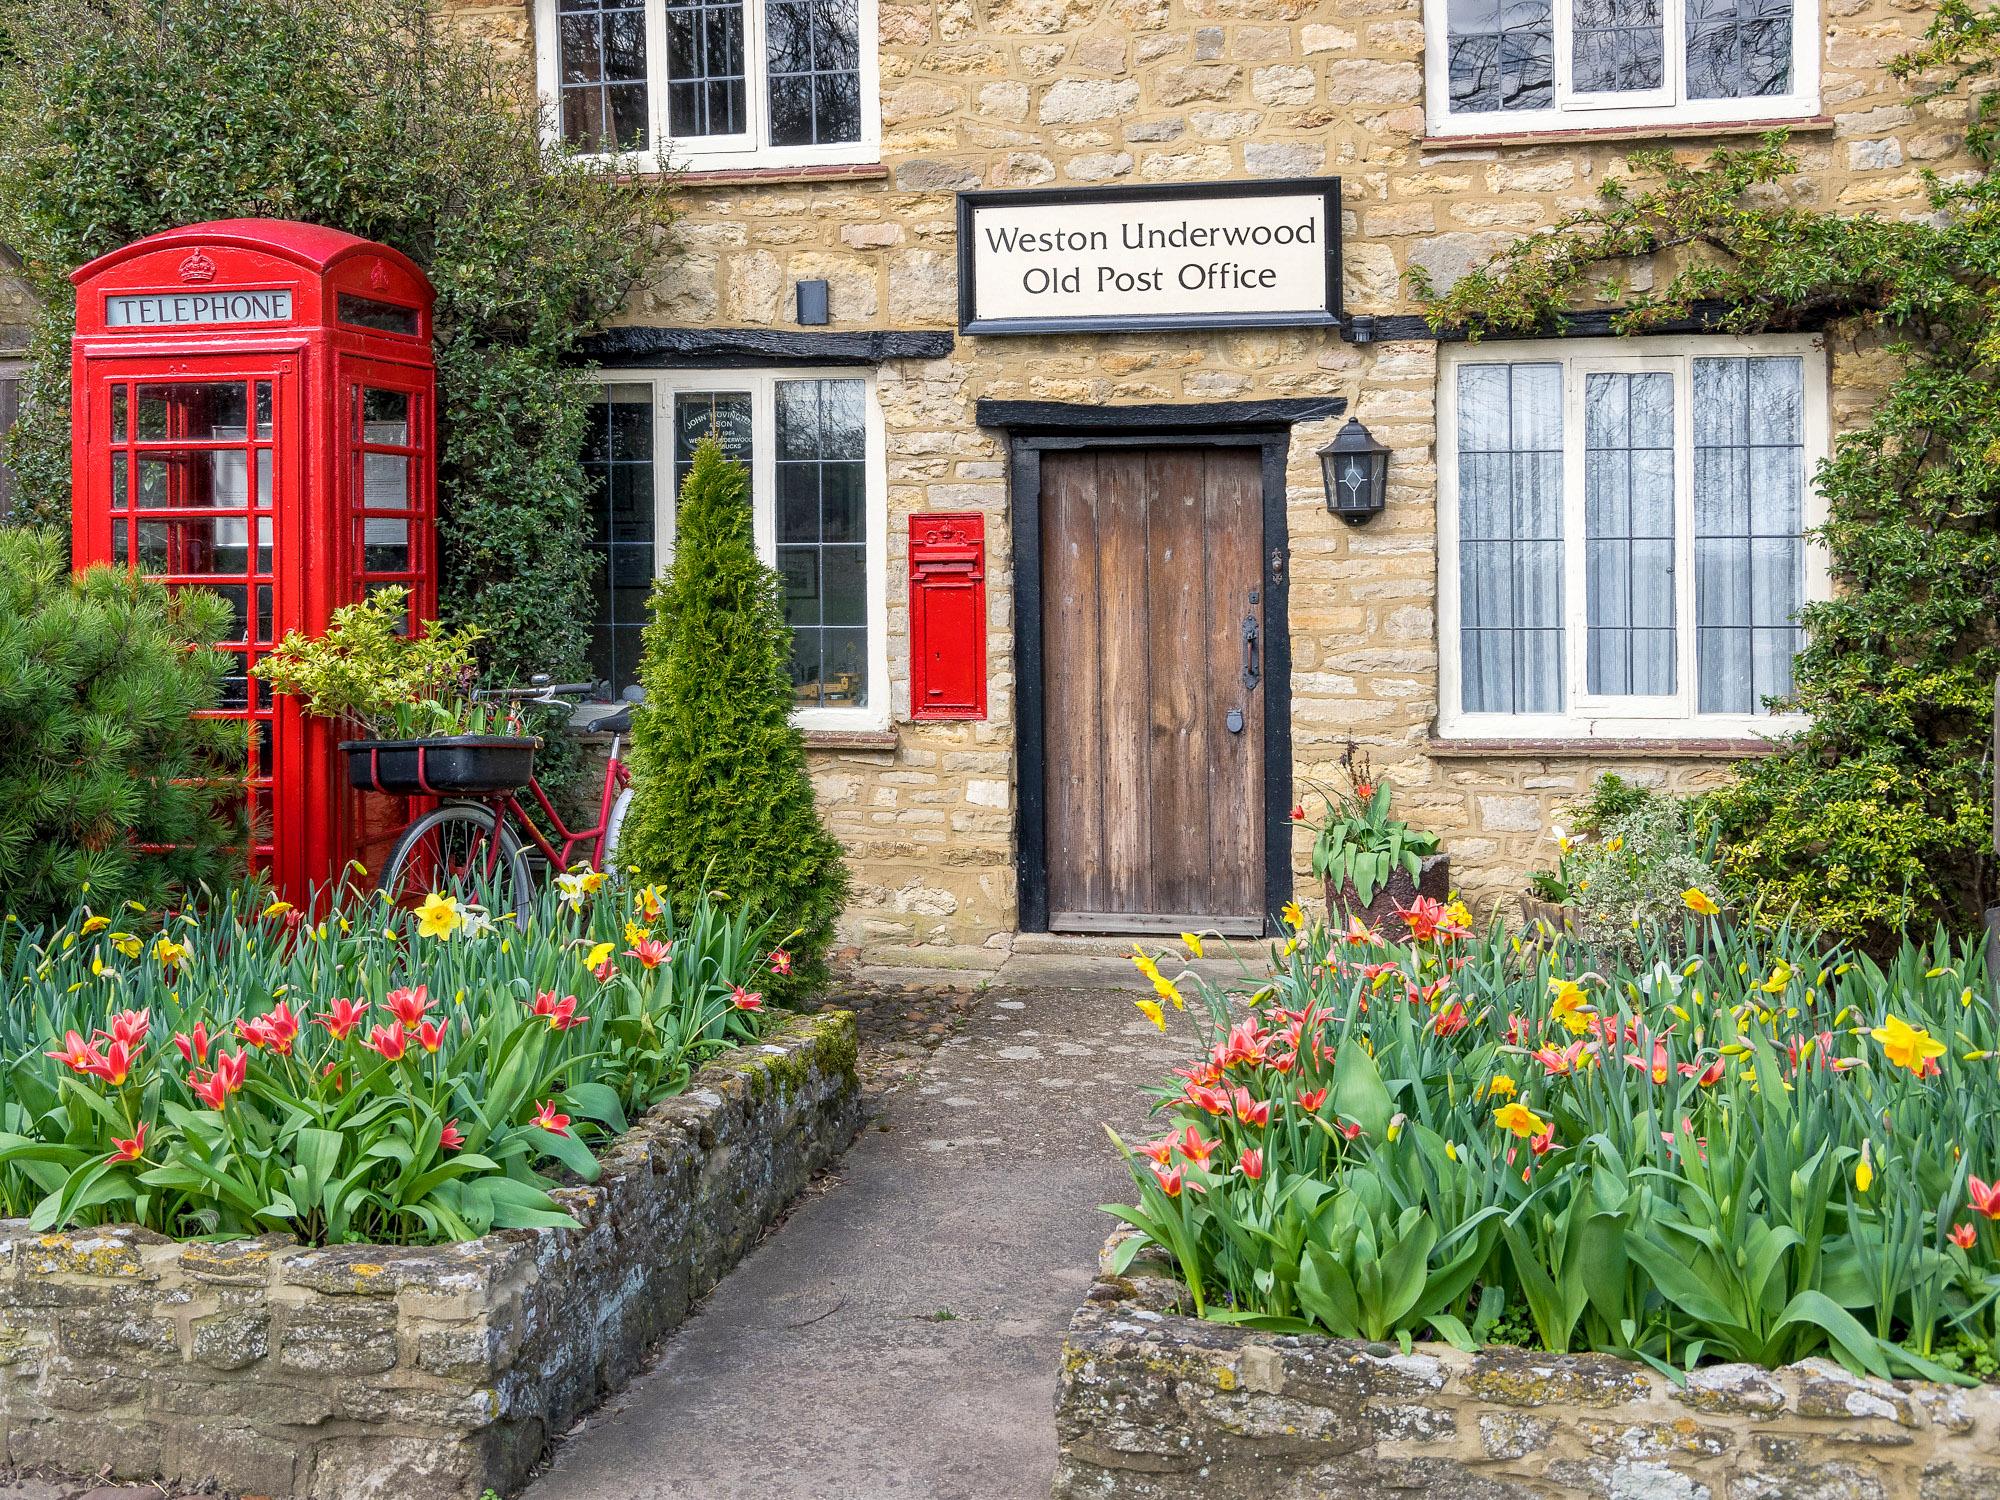 Weston Underwood, Buckinghamshire by Ken Barley.jpg